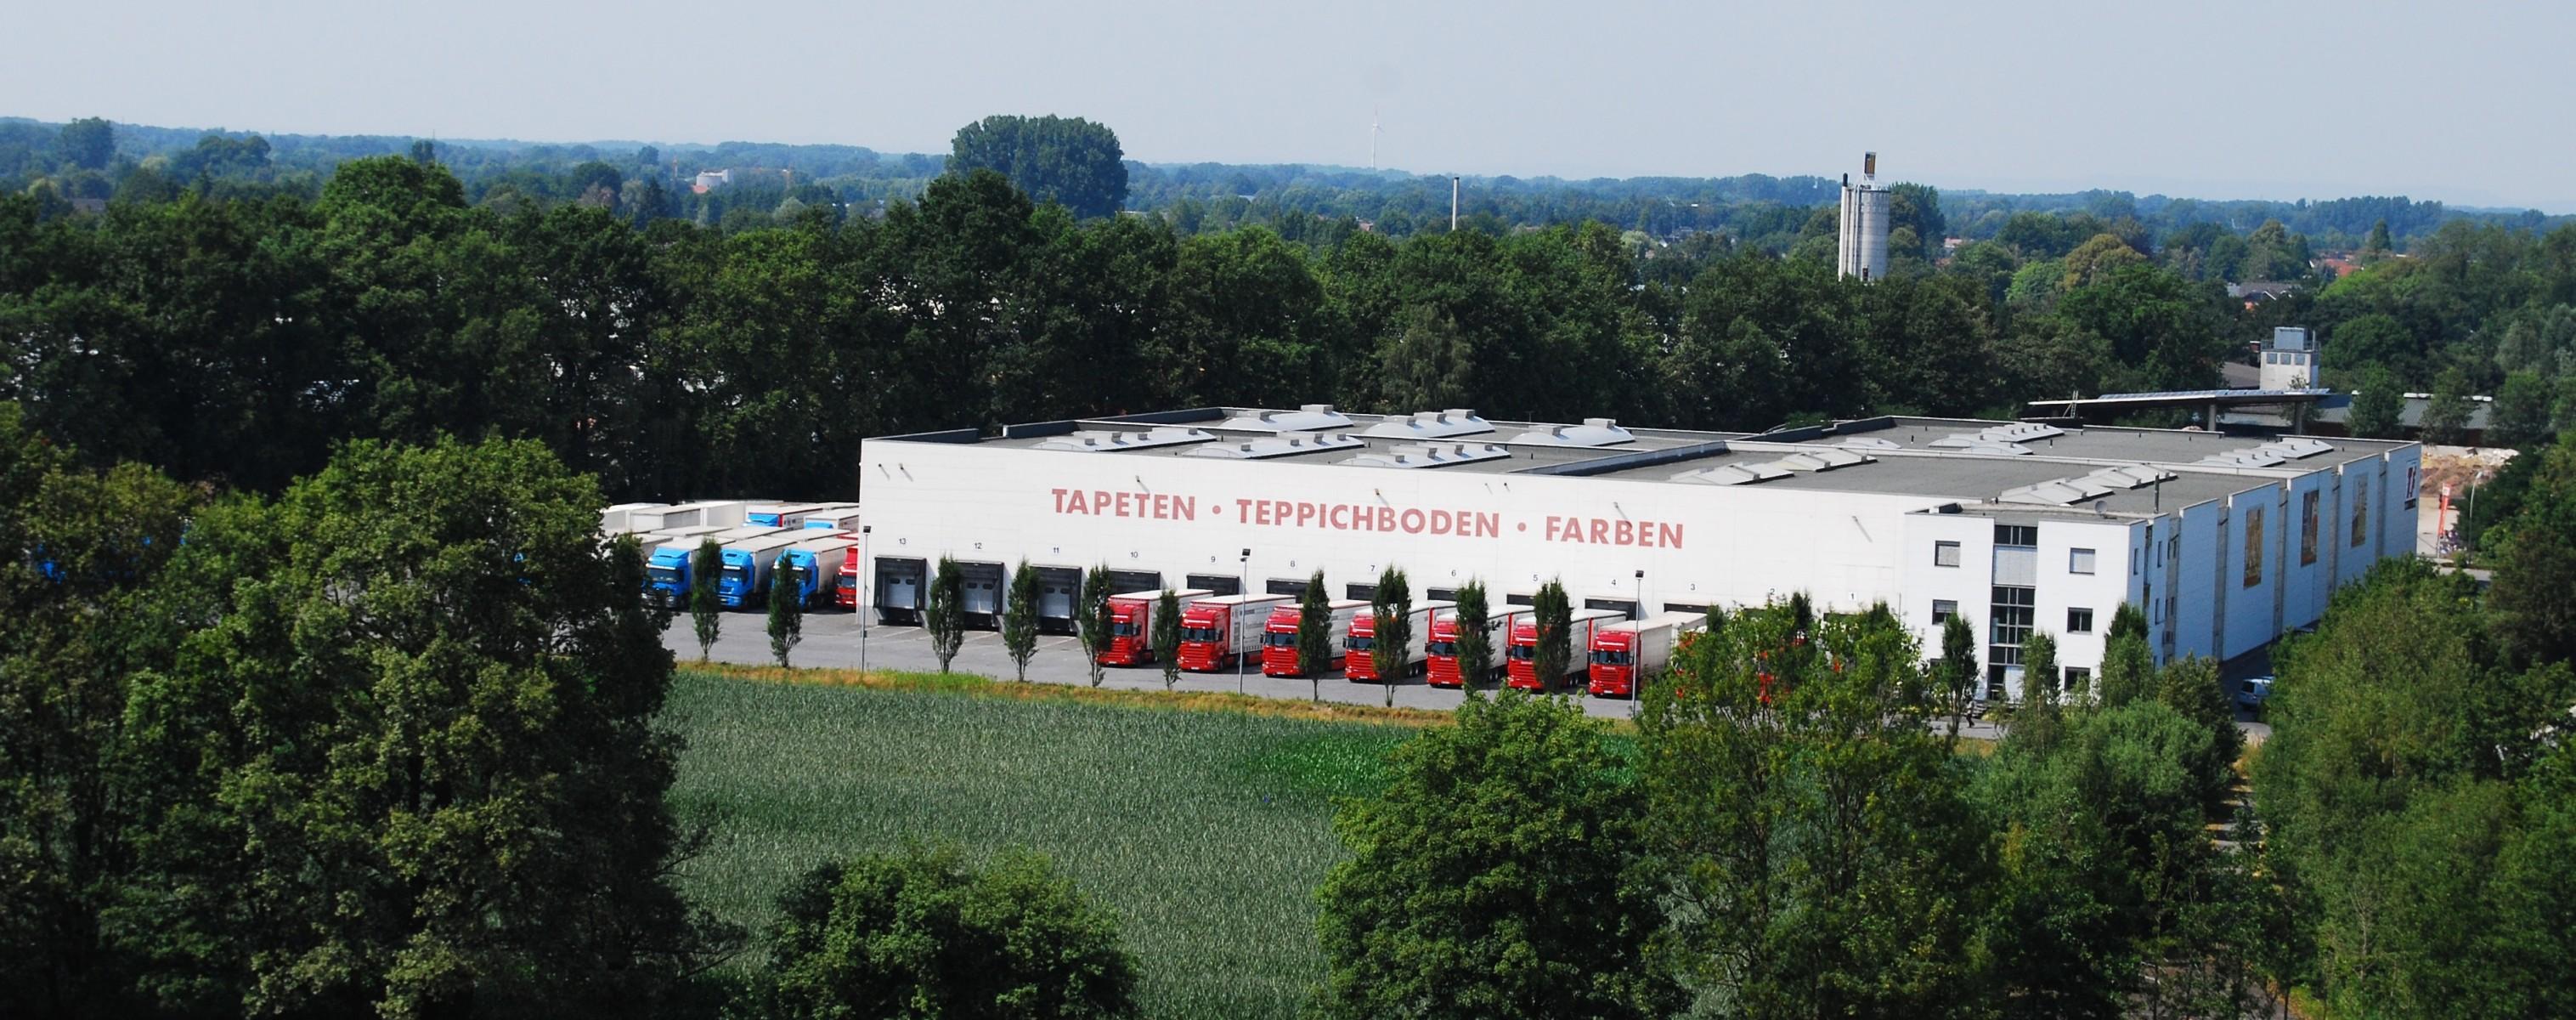 About us reinkemeier rietberg trade logistics shopfitting - Reinkemeier rietberg ...